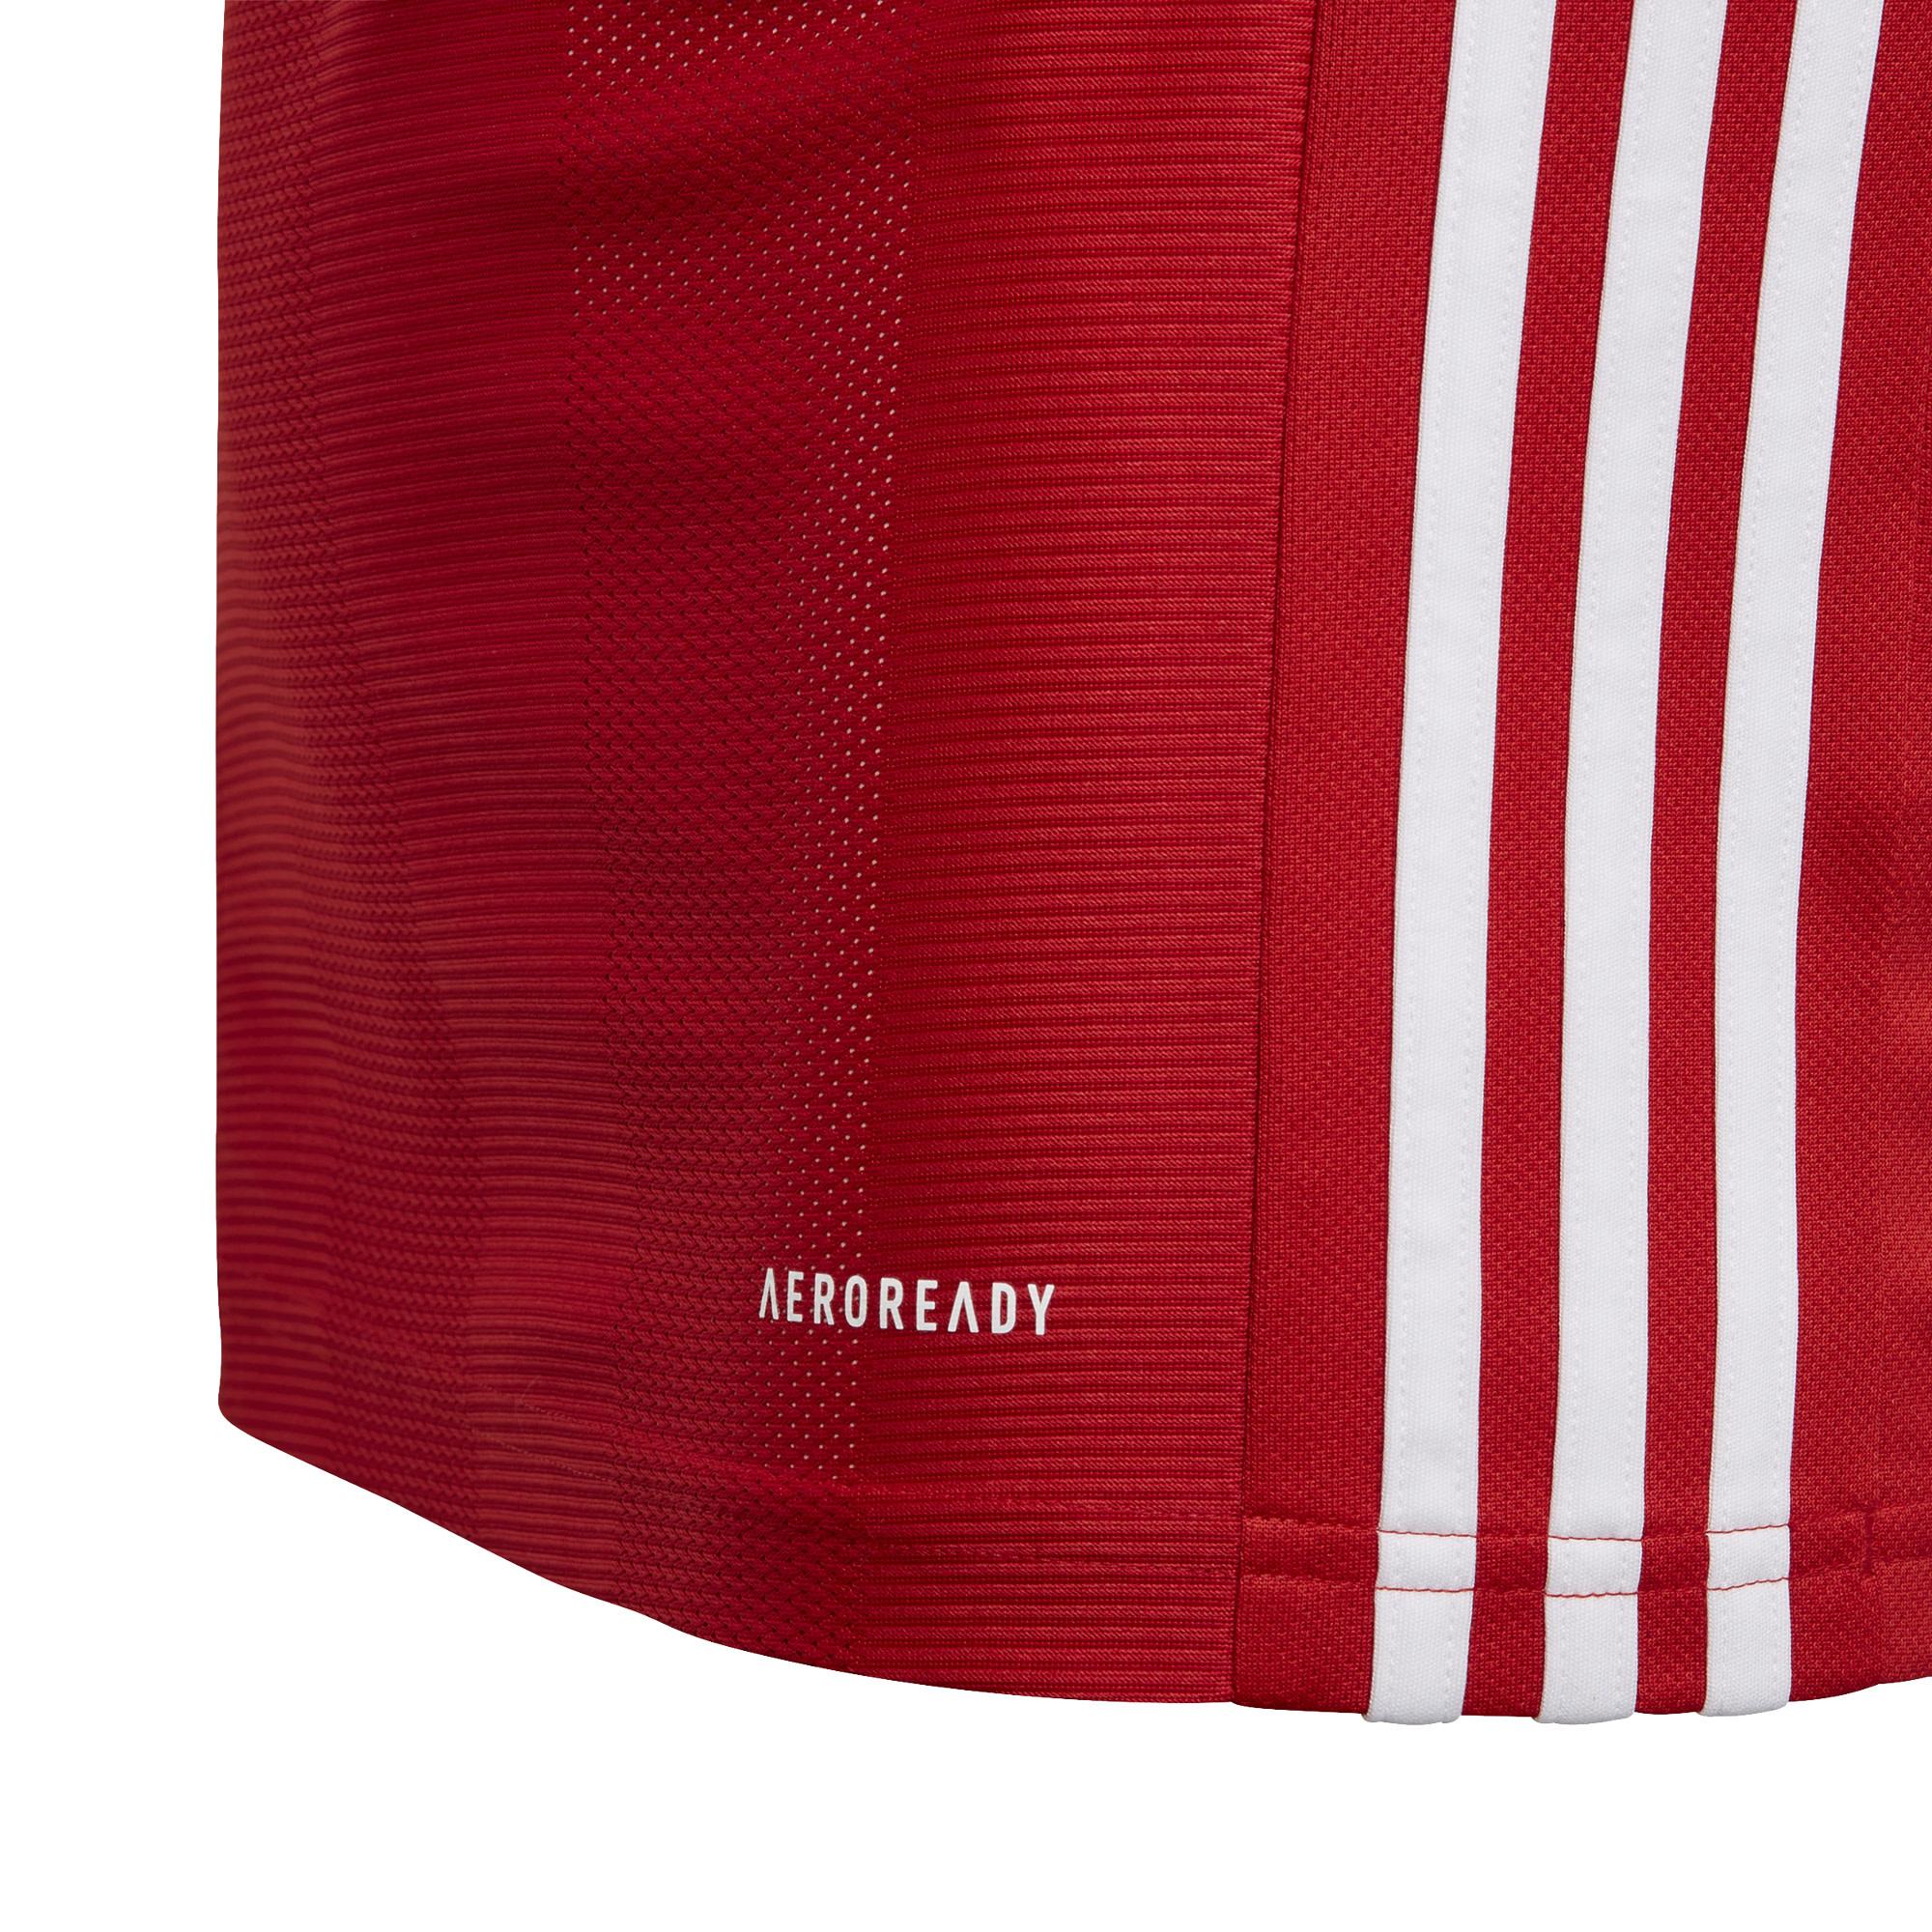 Adidas ADIDAS JR Bayern München Home Jersey '20-'21